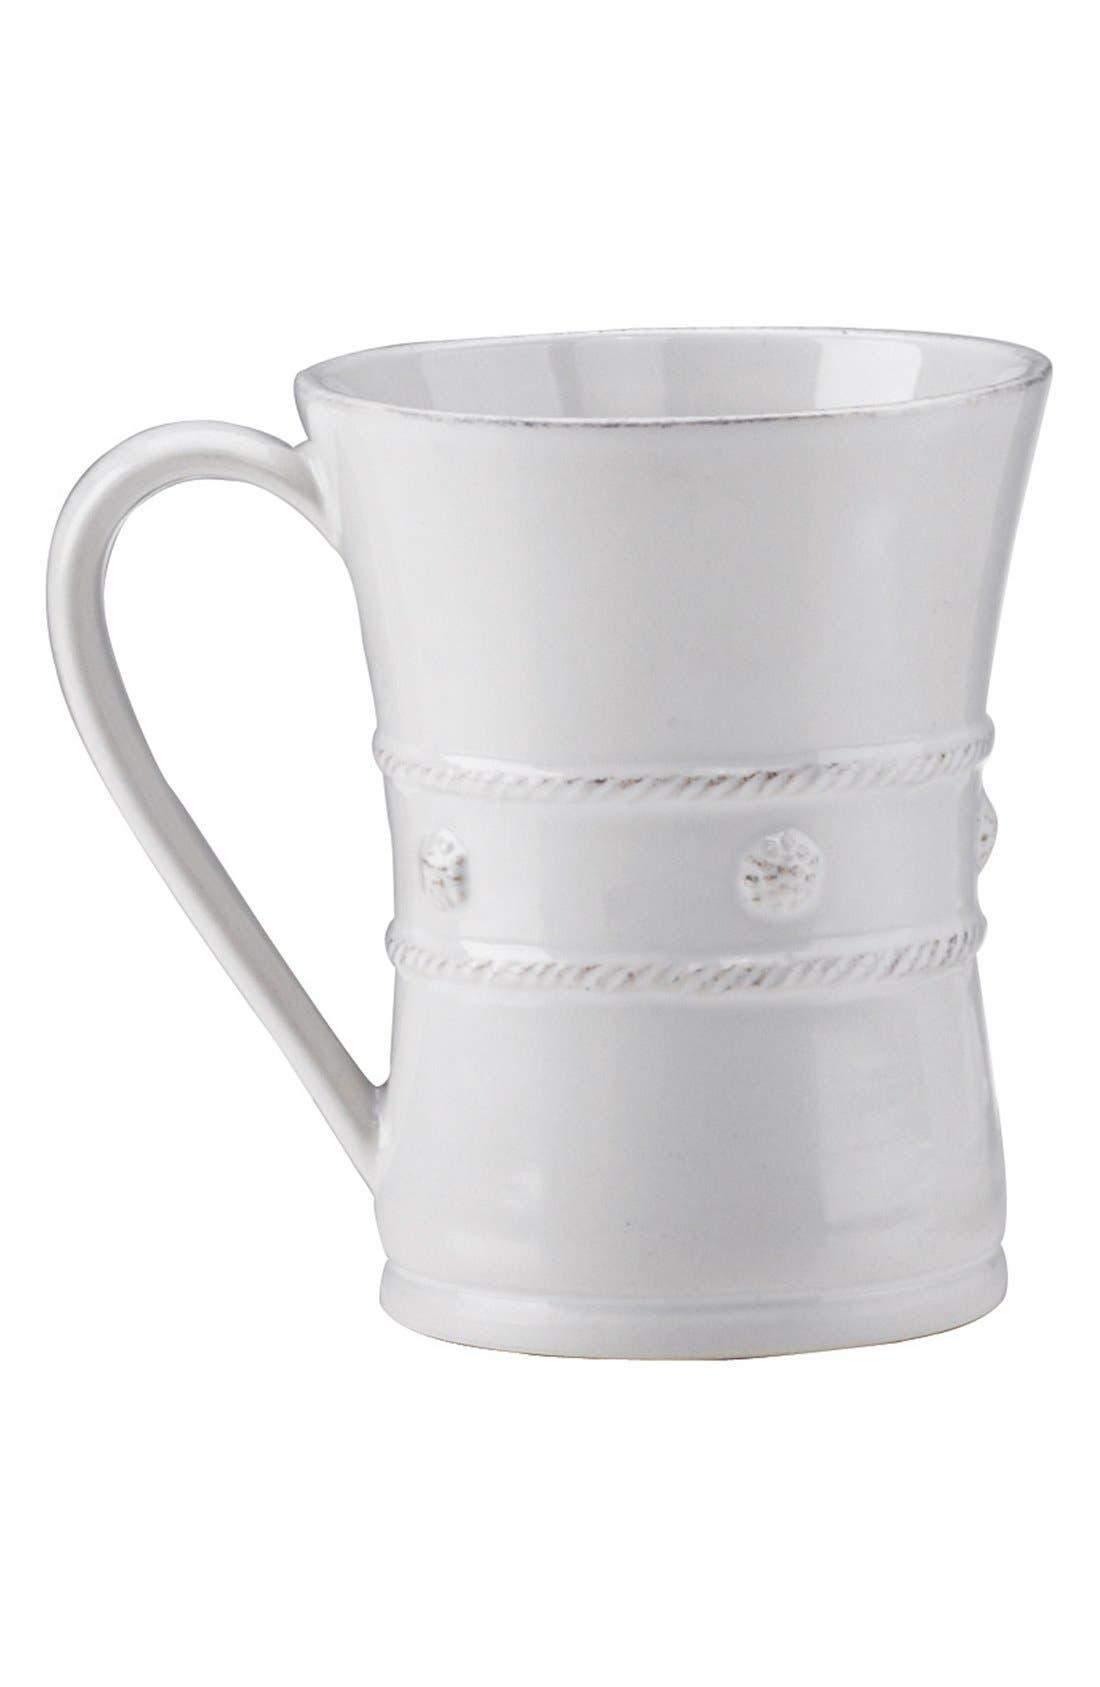 'Berry and Thread' Ceramic Coffee Mug,                         Main,                         color, Whitewash